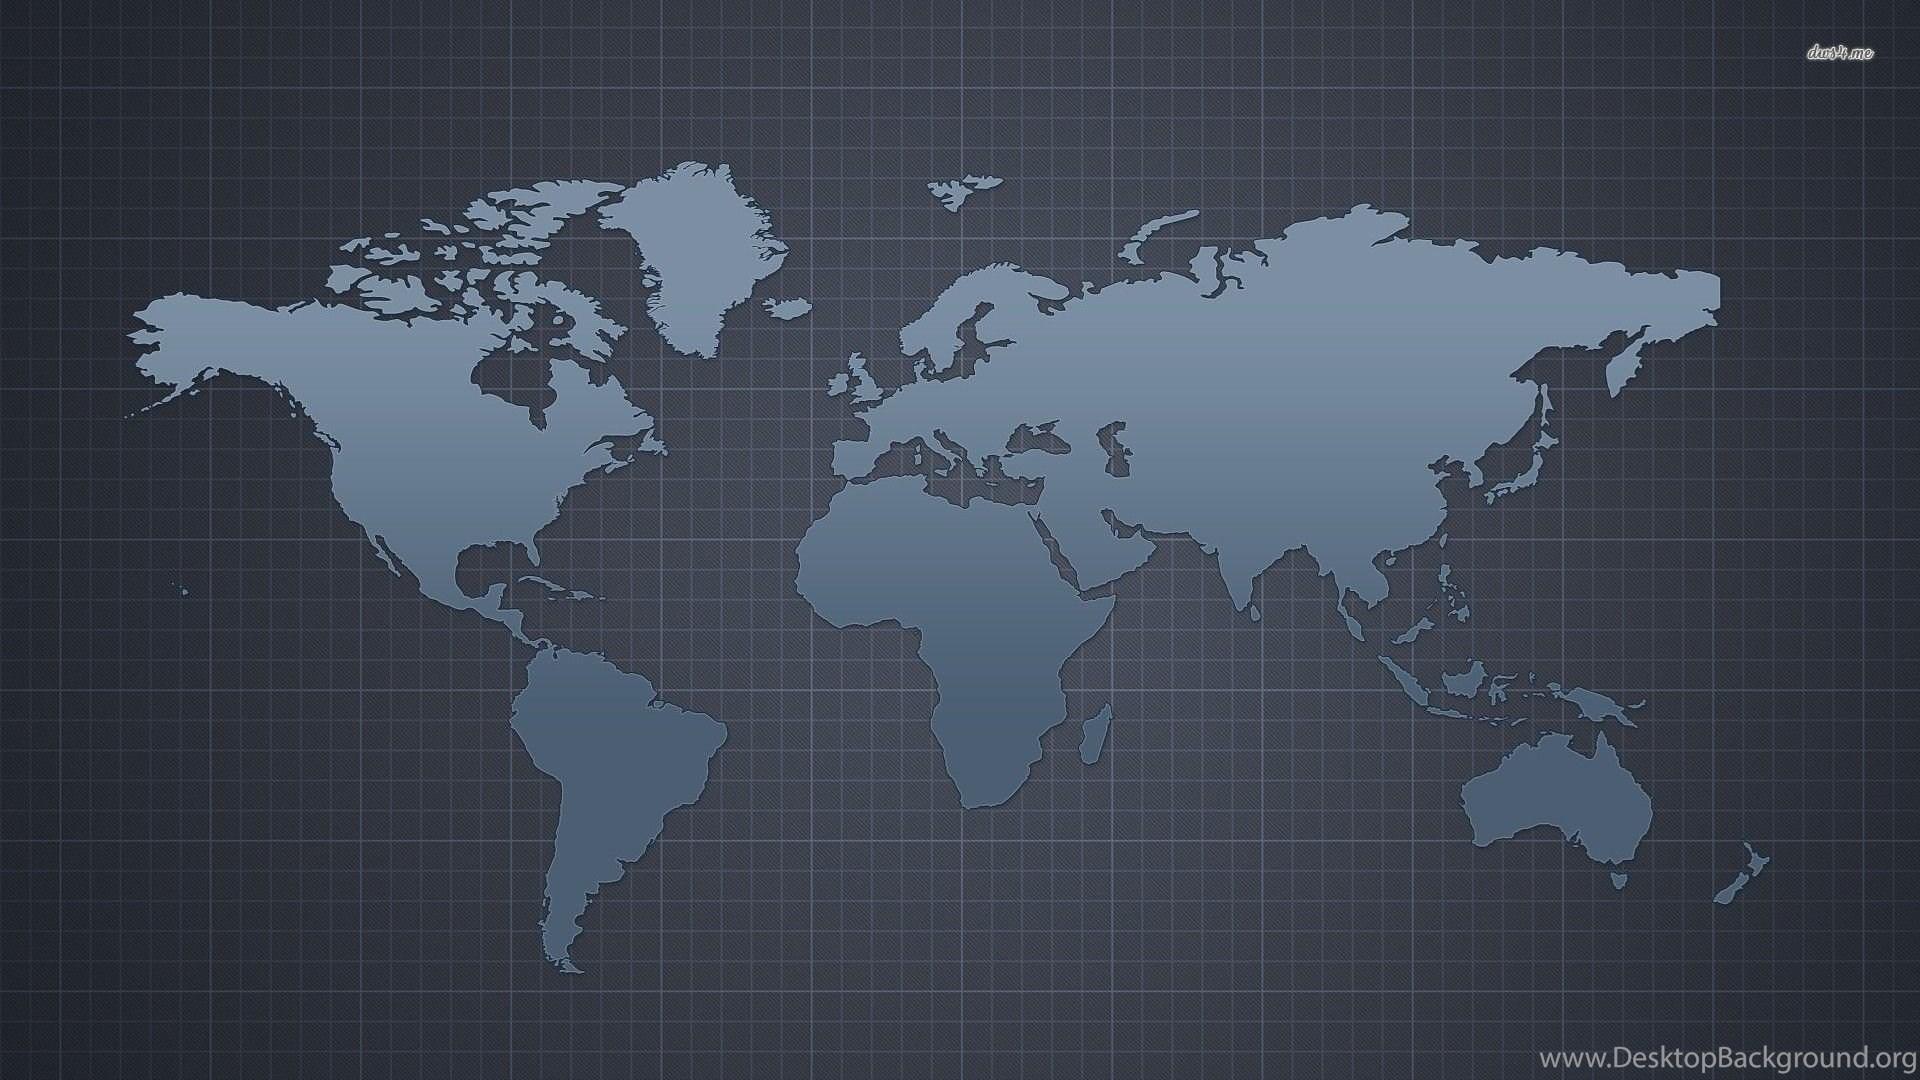 World map wallpapers digital art wallpapers desktop background popular gumiabroncs Images